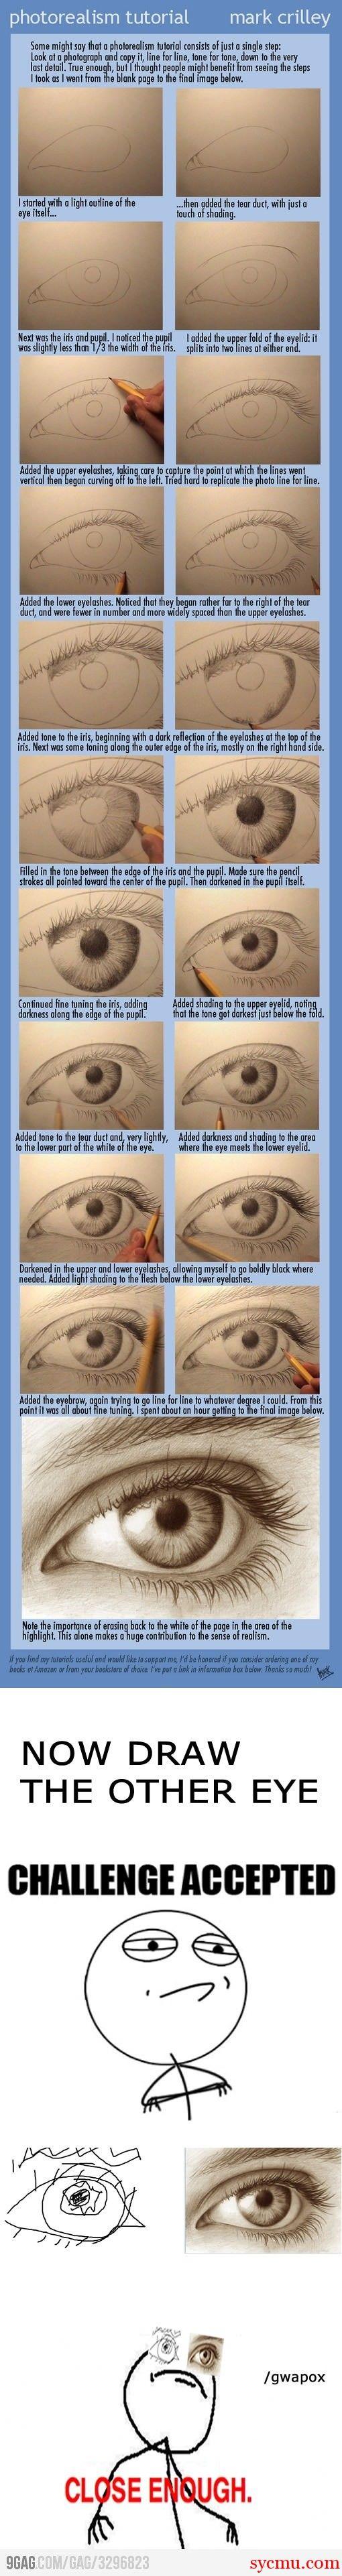 Learn To Draw An Eye